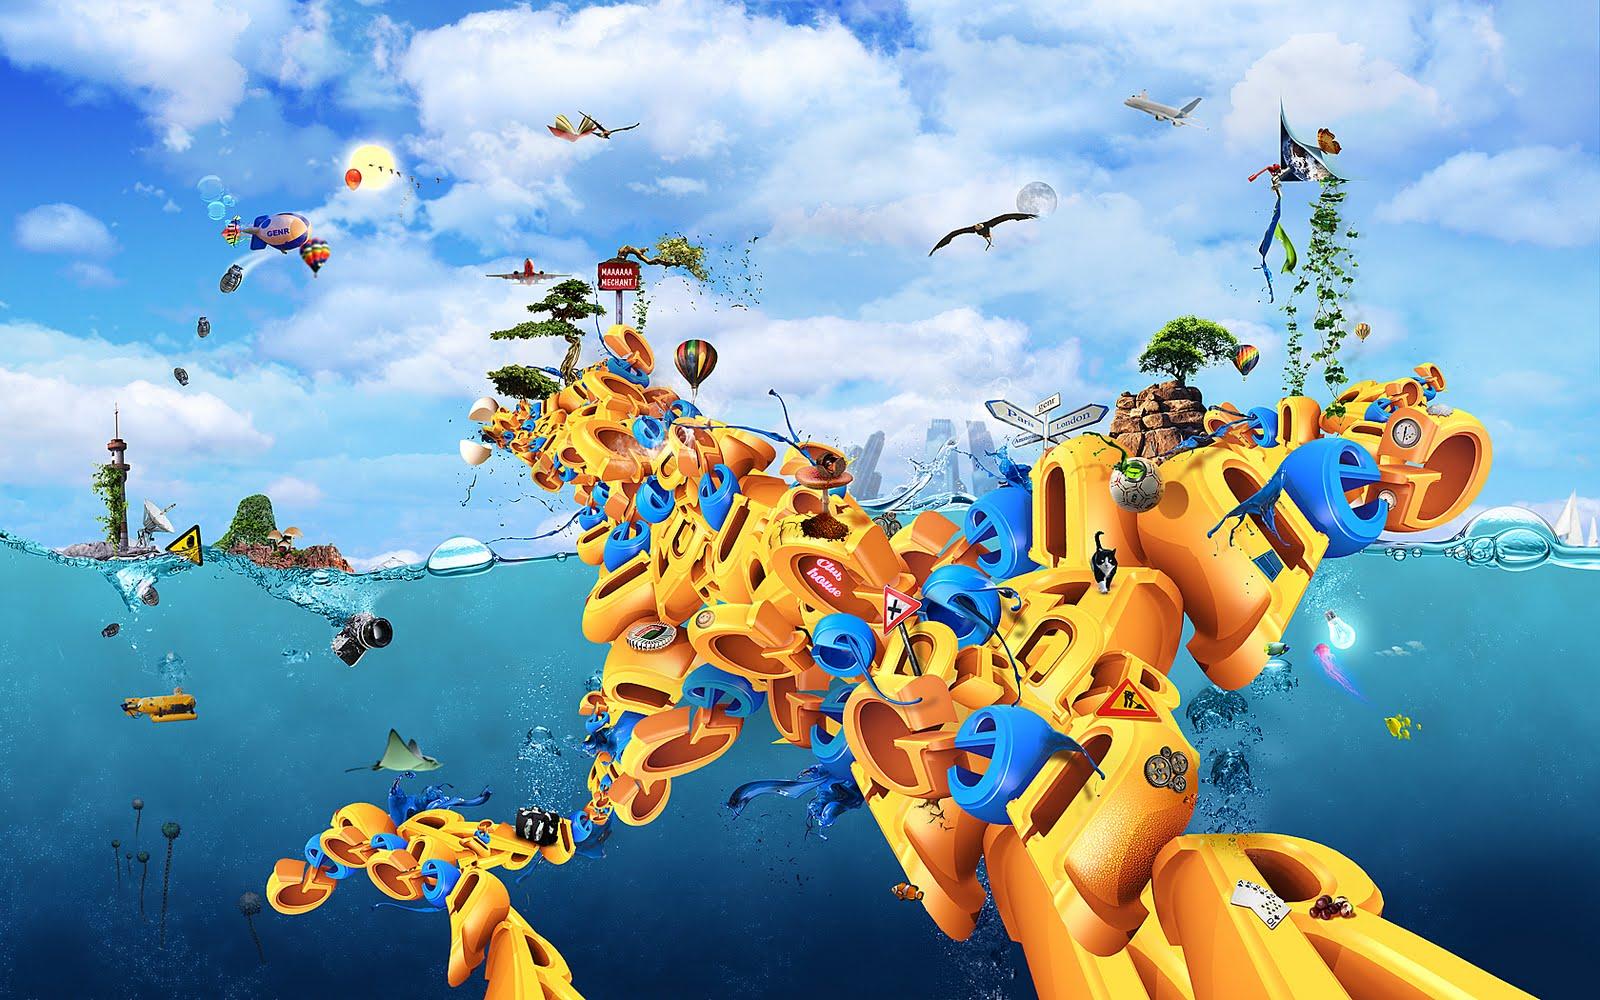 Artistic   Abstract Images 1680 x 1050 Hd Desktop Wallpaper 1600x1000